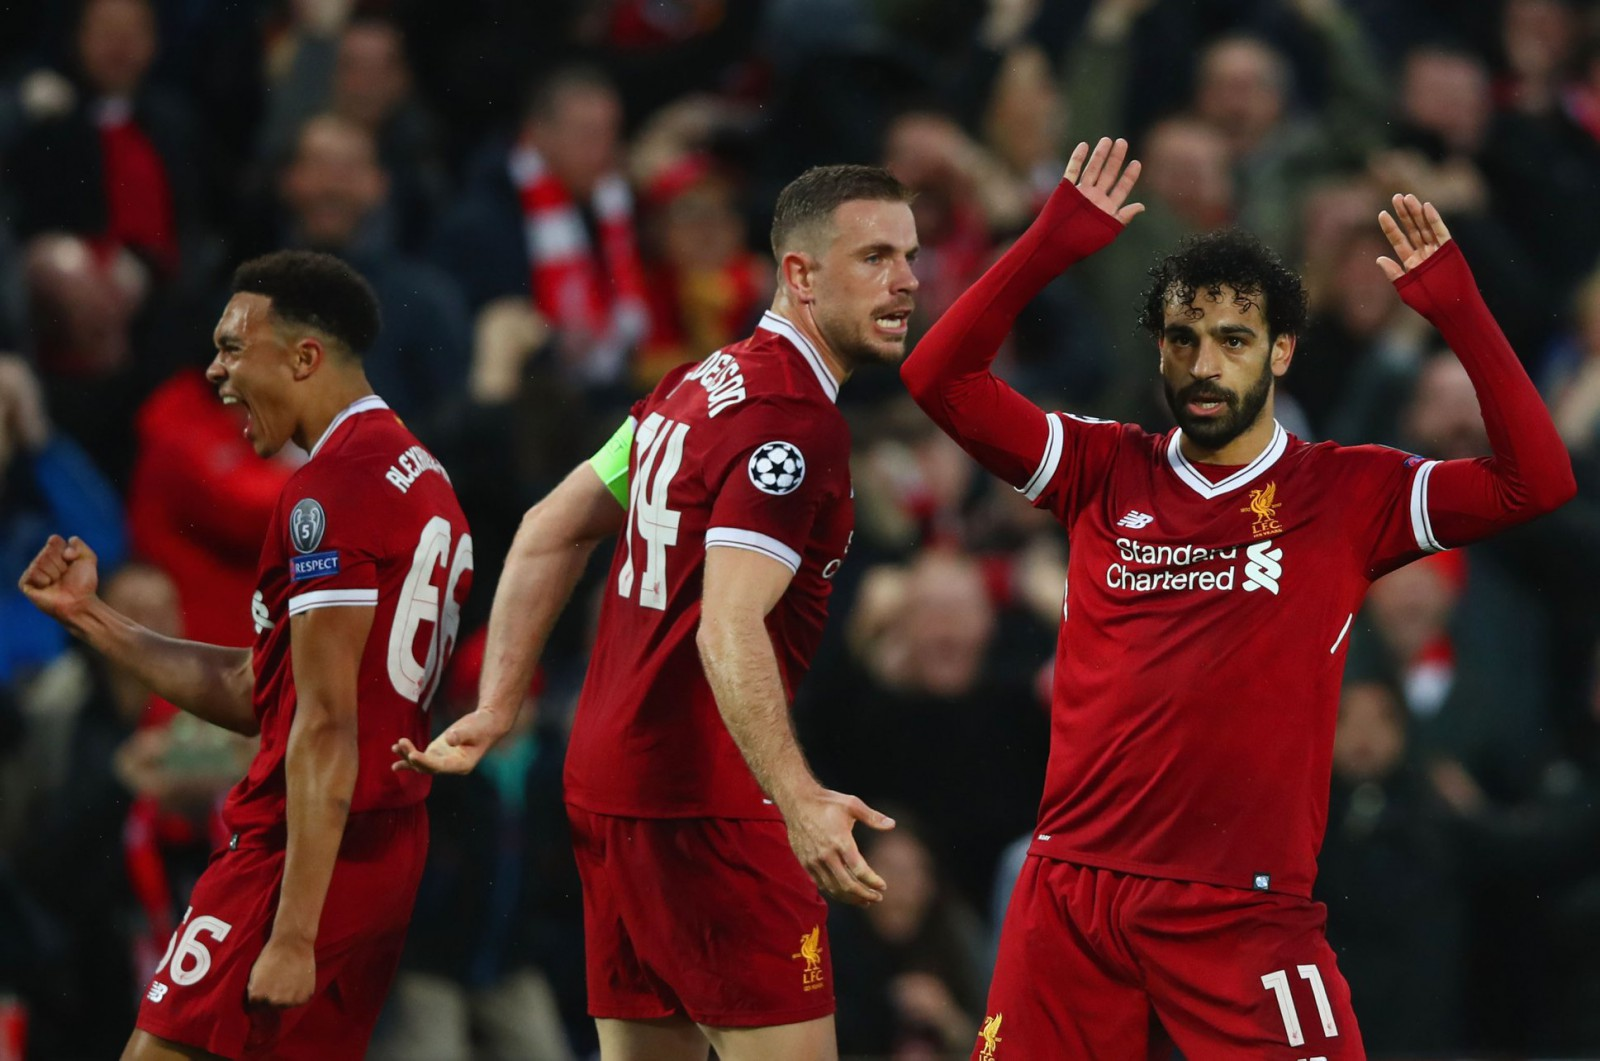 Liverpool 5-2 AS Roma: Mohamed Salah a avut o prestație fenomenală pe Anfield